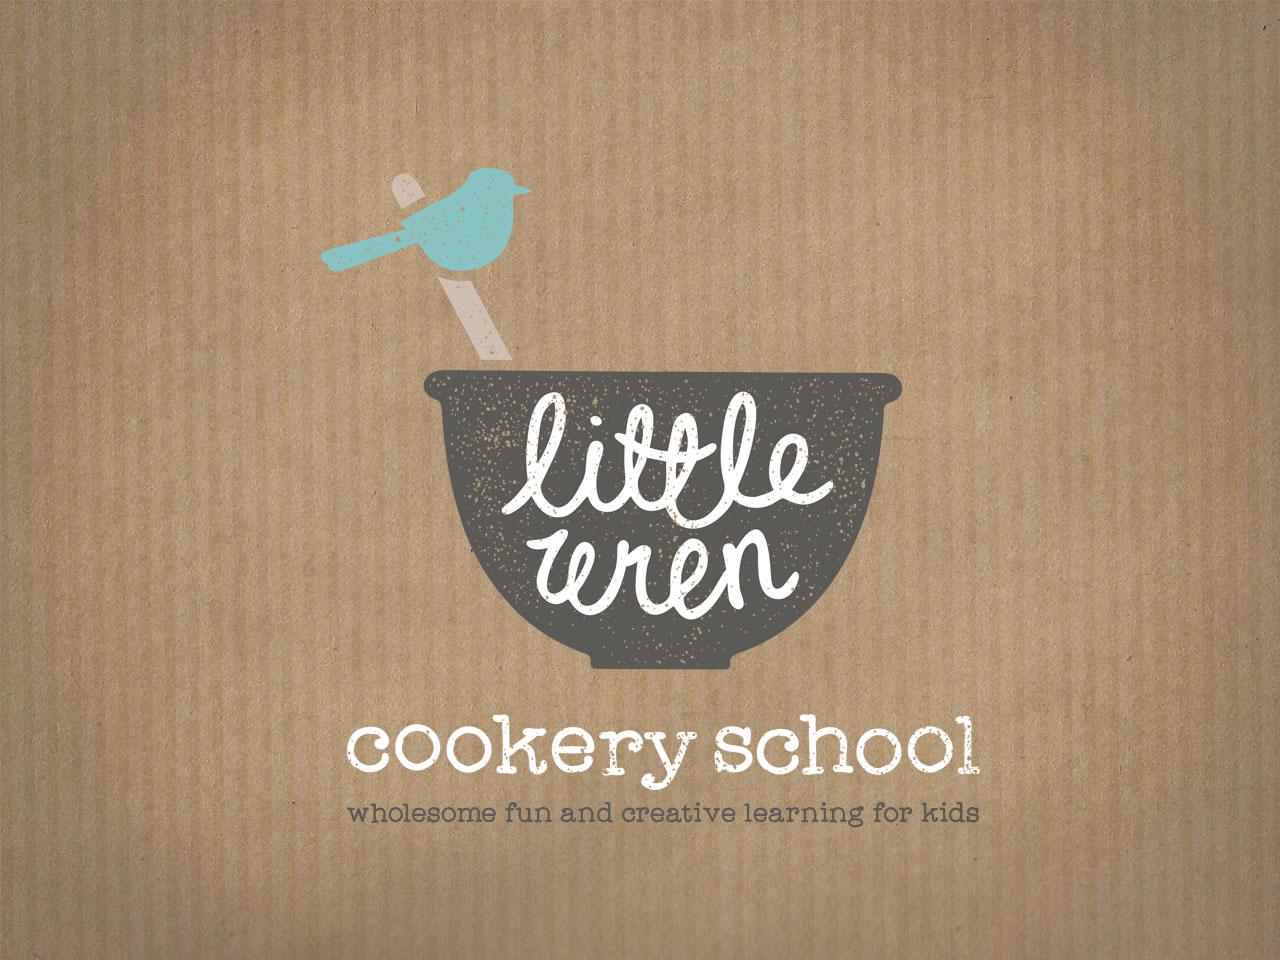 LITTLE WREN COOKERY SCHOOL - Artisan Rebrand. Morrison Design, Graphic Design and Branding Agency Geelong, Melbourne, VIC.